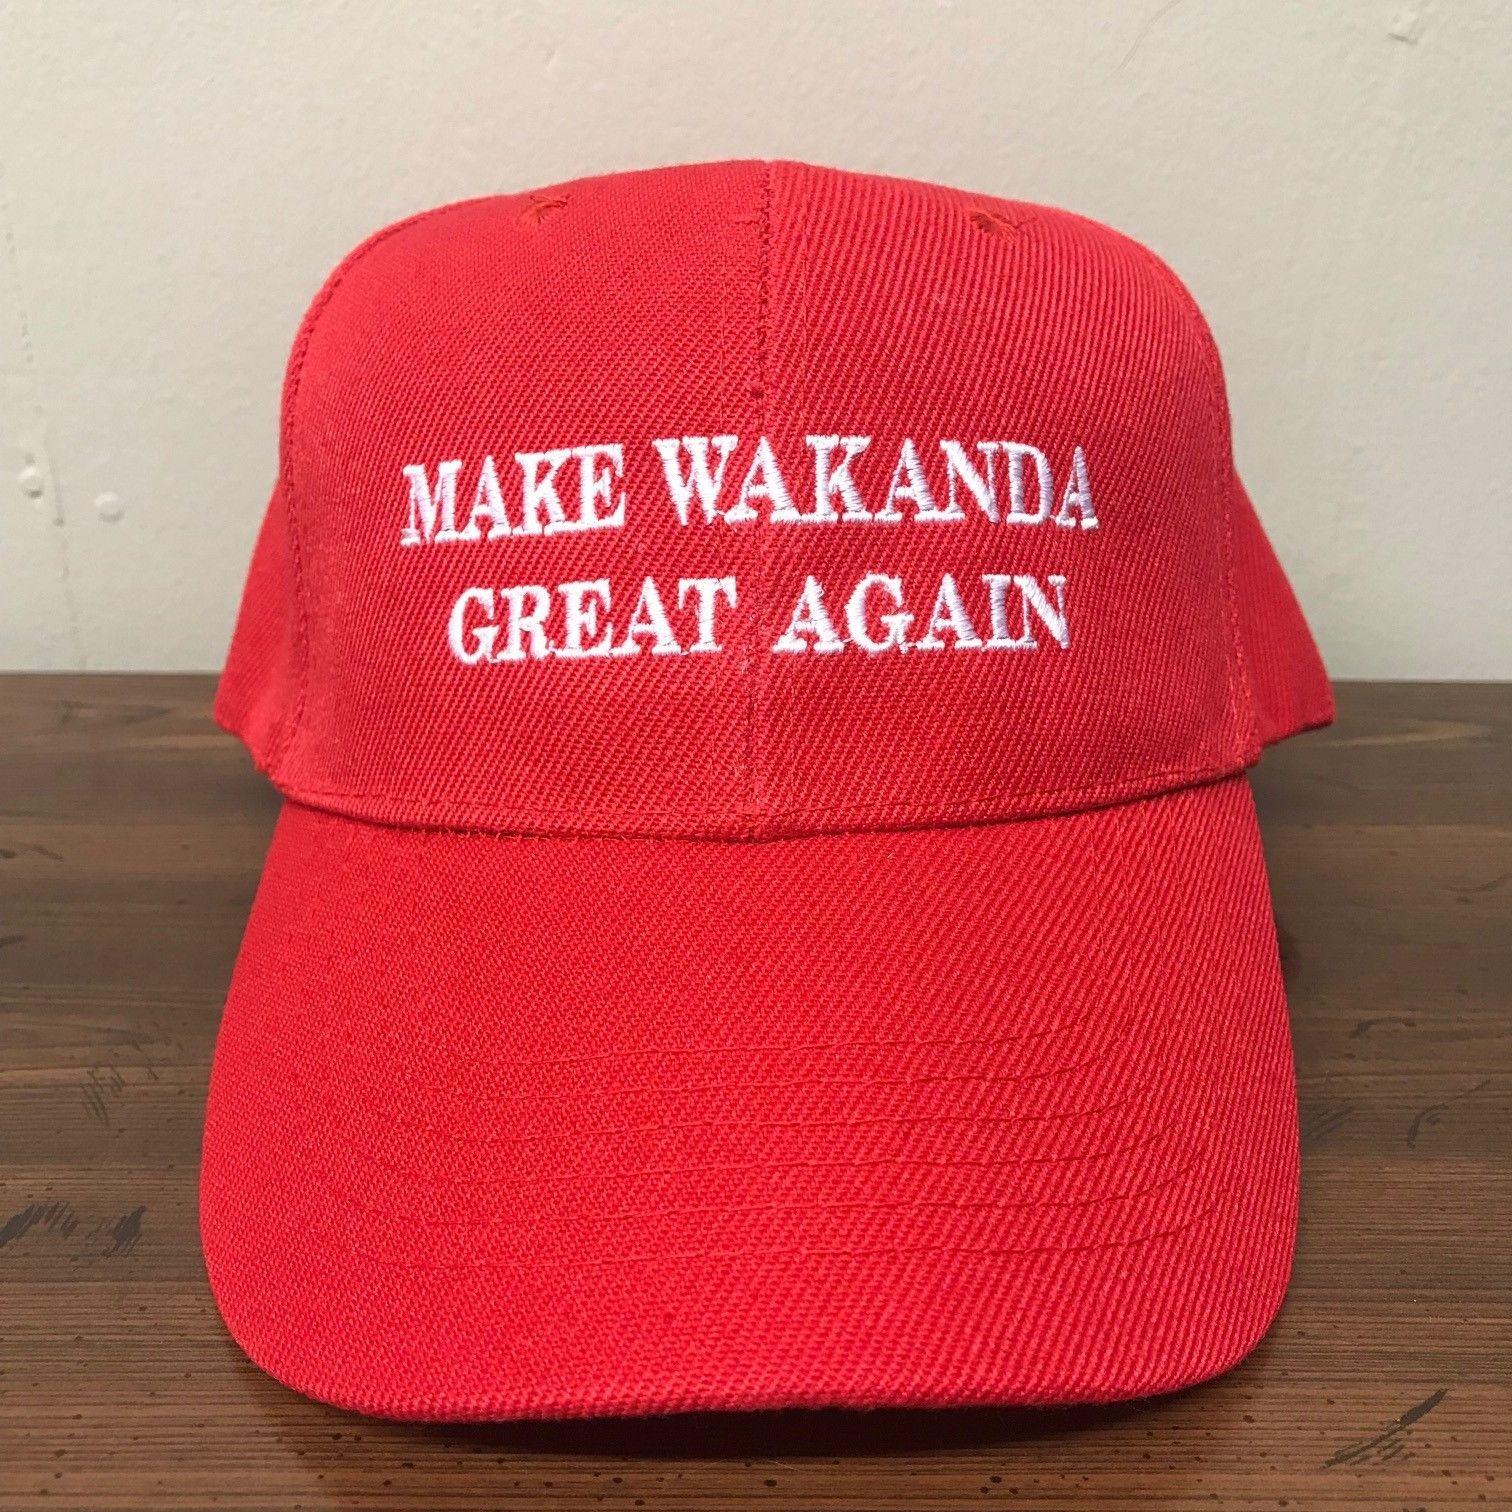 Make Wakanda Great Again Wakanda Hat Wakanda Cap Black Panther Hat Cap Red 30045acfbcf6